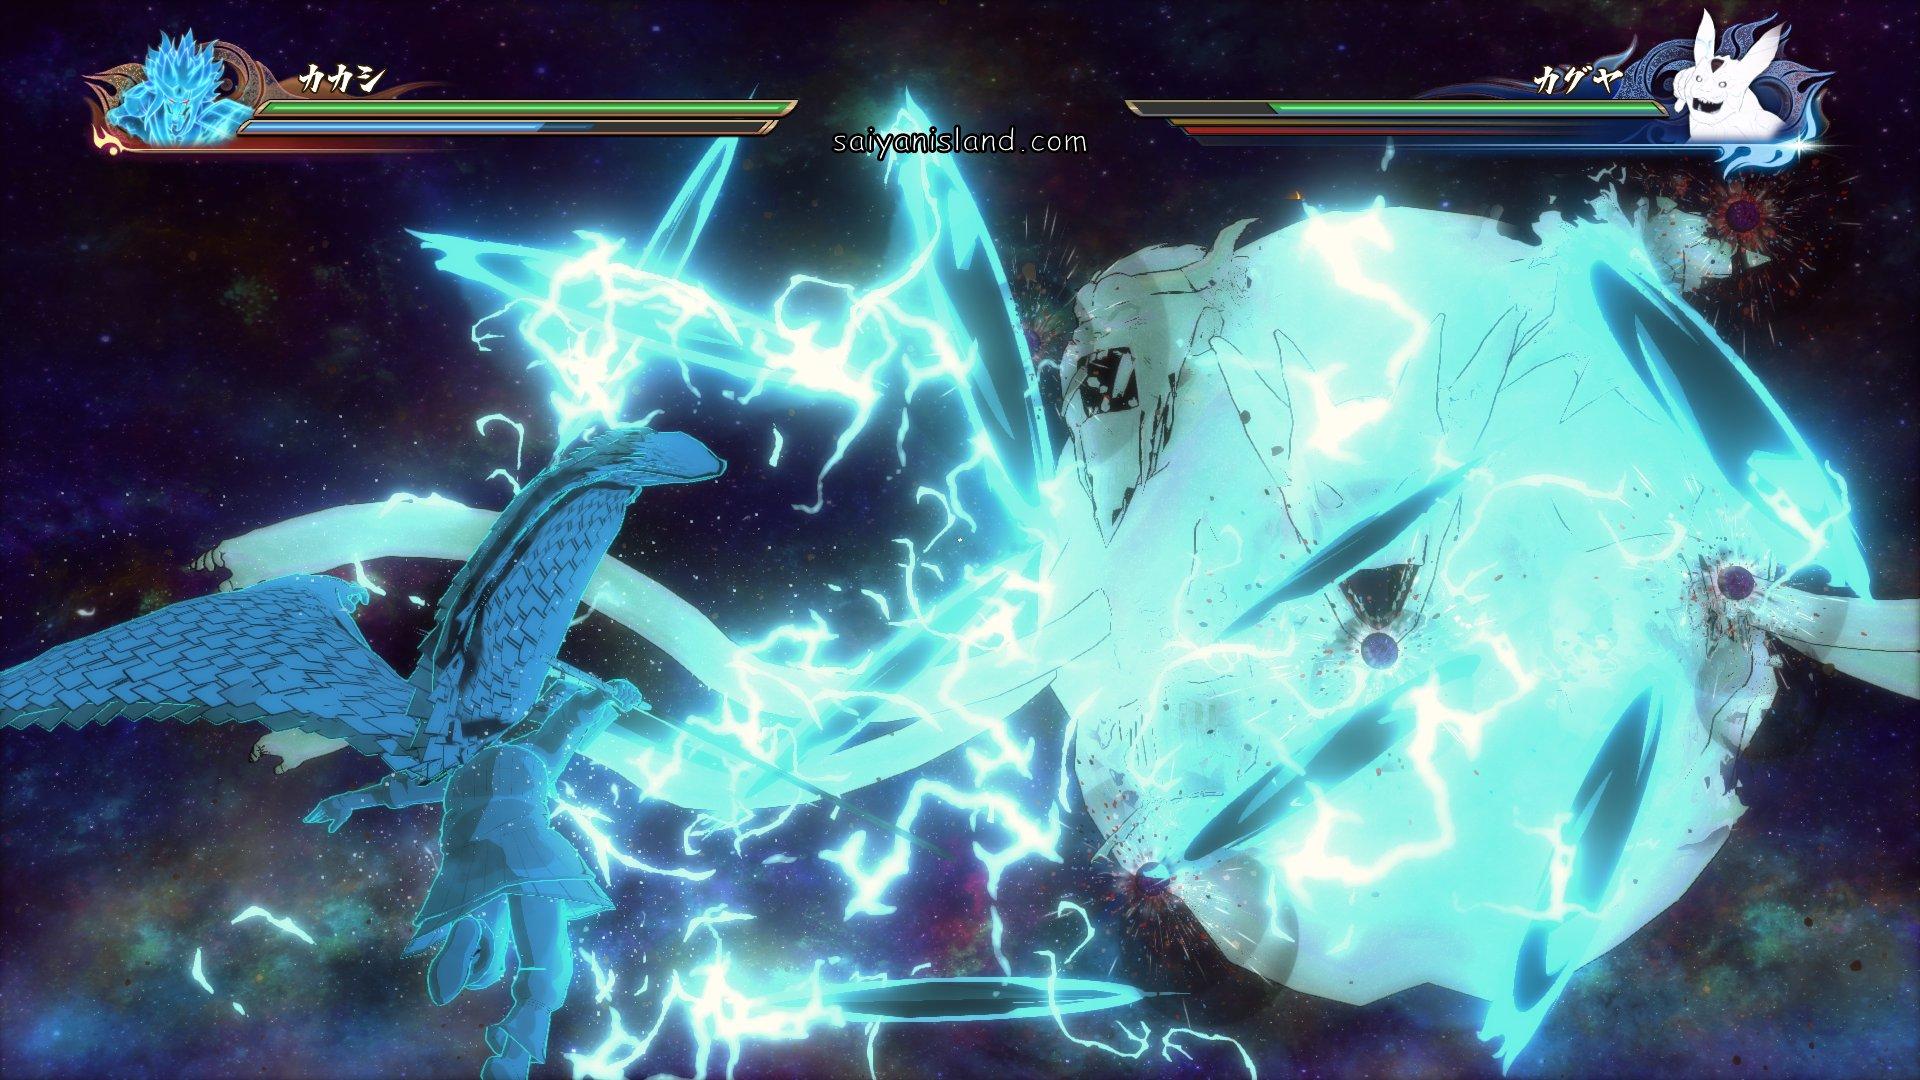 Naruto-Storm-4-1 Naruto Storm 4: Yeni Kuyruklu Canavar Kaguya Ekran Görüntüleri